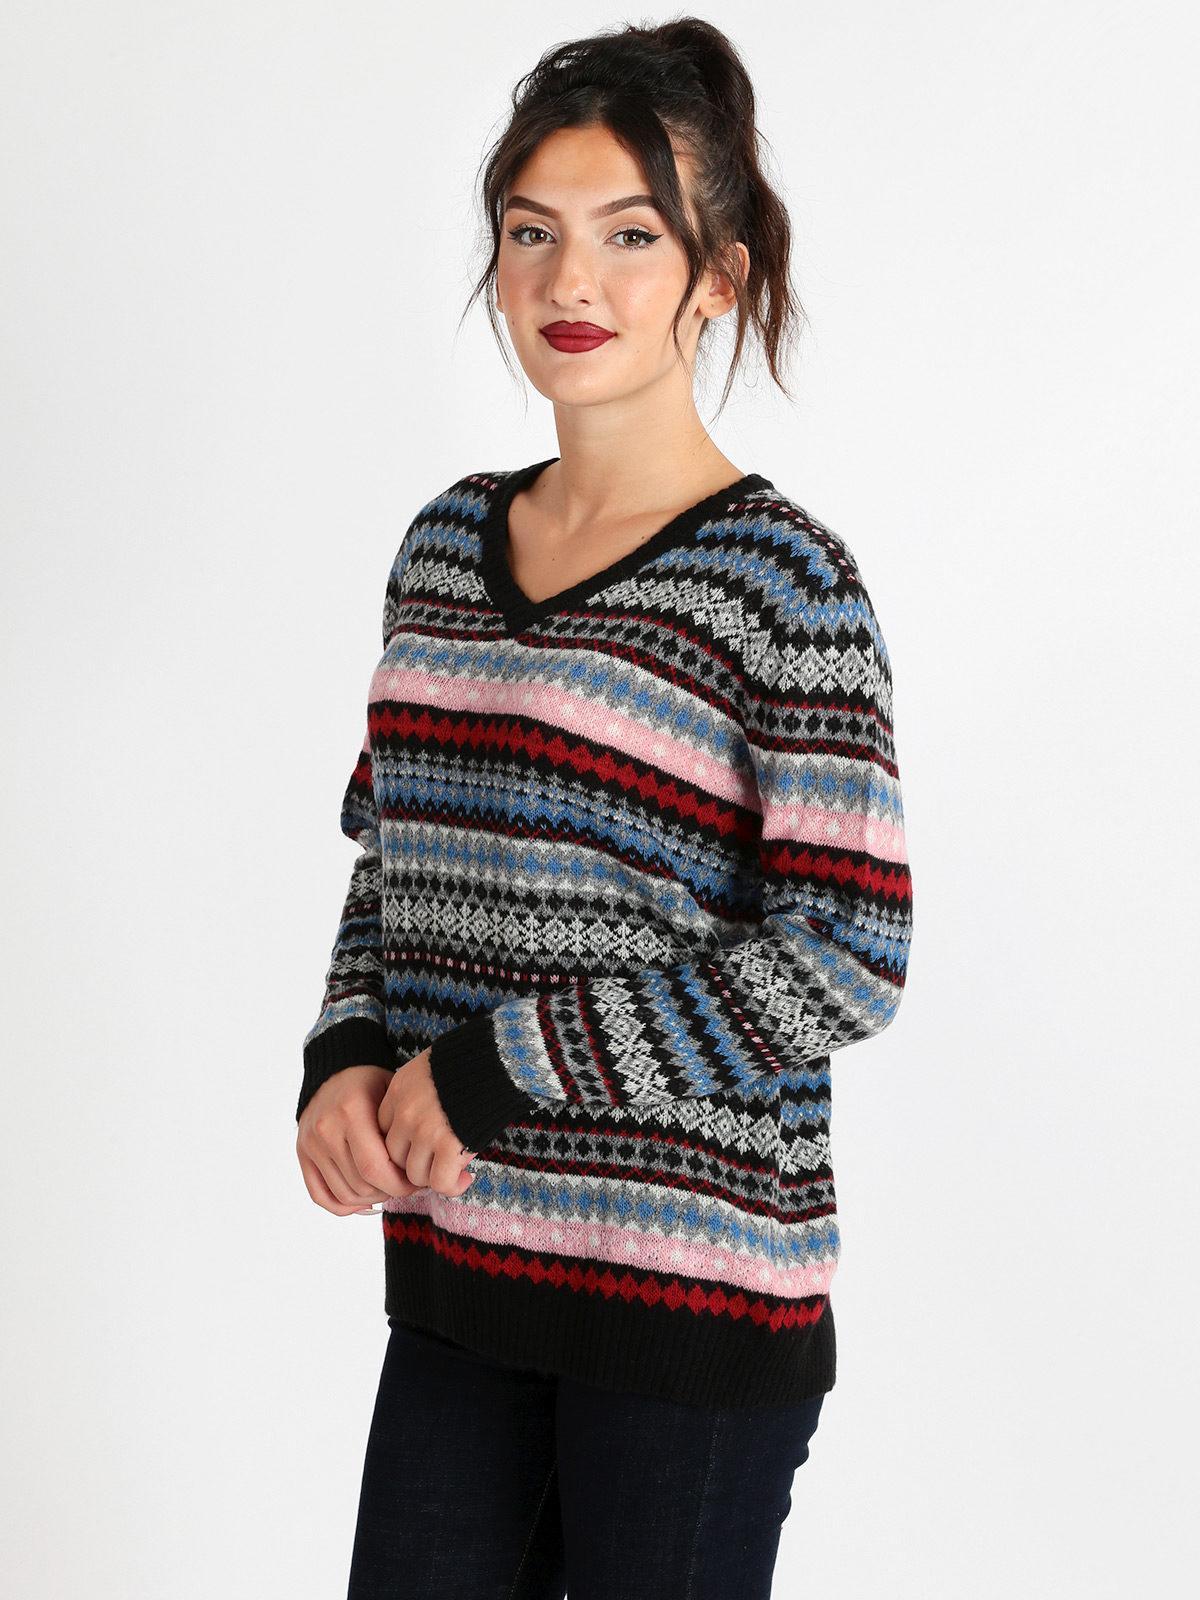 a basso prezzo 08c02 42432 Maglione norvegese donna wendy trendy | MecShopping